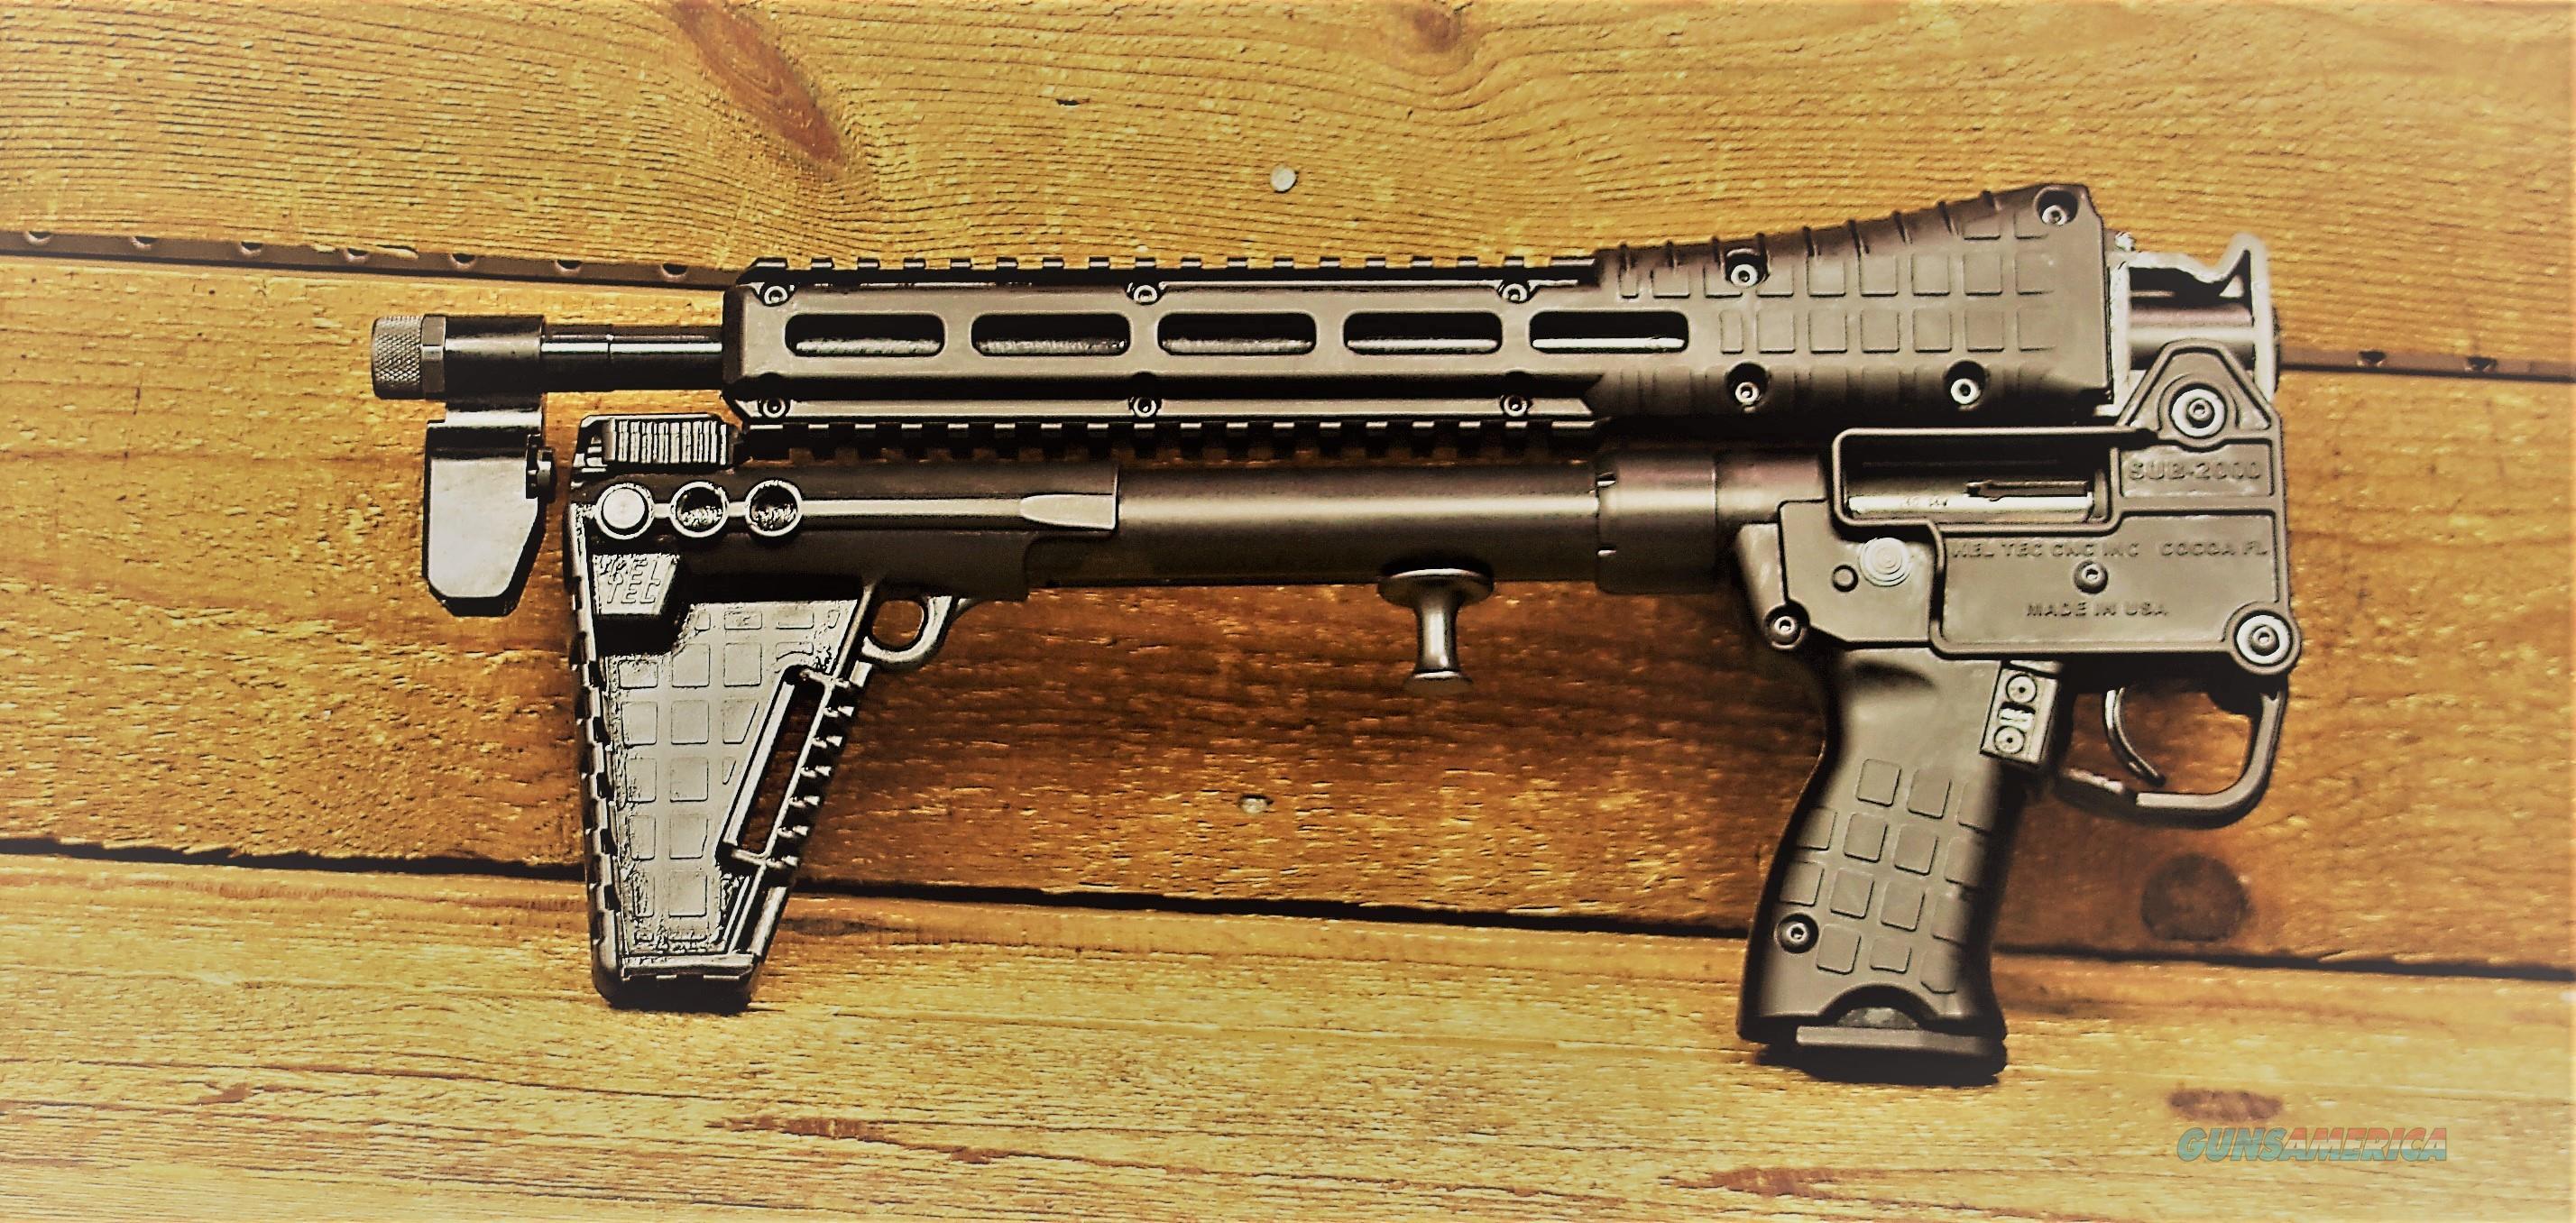 "EASY PAY $38 LAYAWAY  KEL-TEC SUB2000 G2 .40SW 16.25"" barrel threaded Keltec Sub-2000 10 rd 40 Smith and Wesson M&P 40S&W MAGAZINES Magpul M-Lok Picatinny rails TAKEDOWN Black adjustable stock Gator Grip texture SUB40MP   Guns > Rifles > Kel-Tec Rifles"